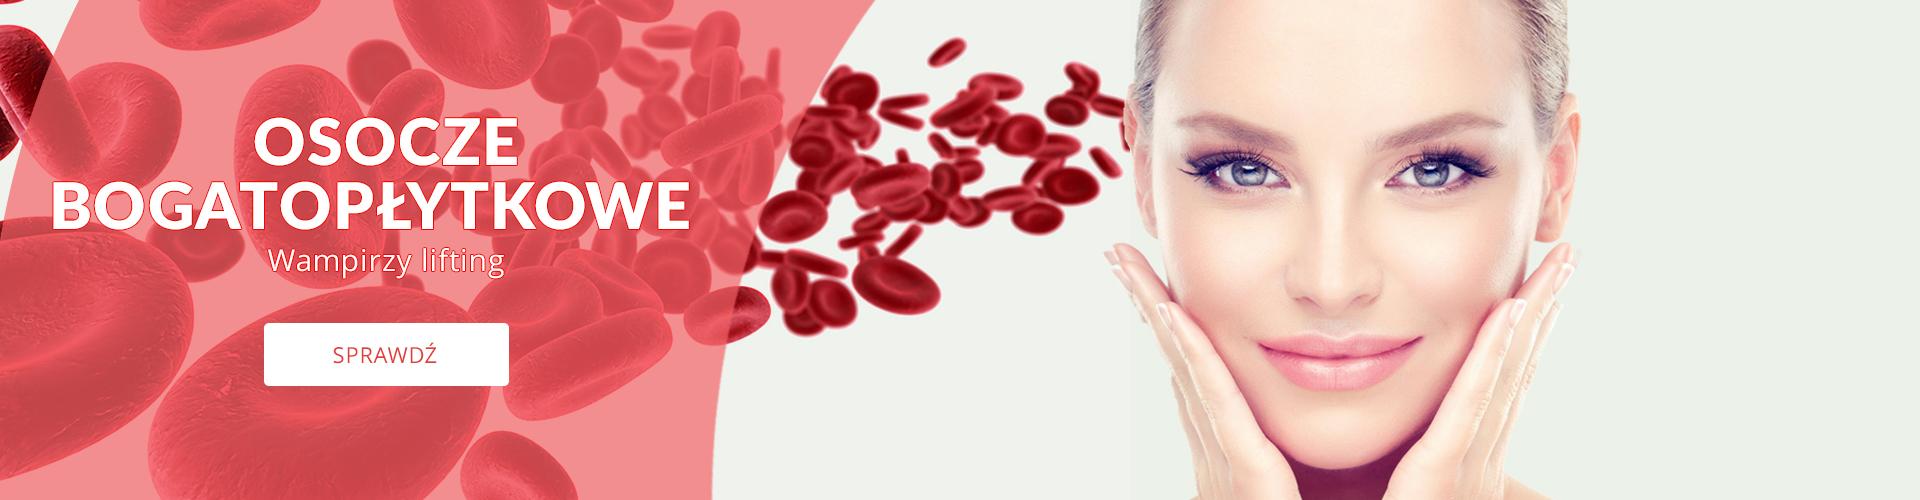 Chirurgia ogólna i onkologiczna, medycyna estetyczna